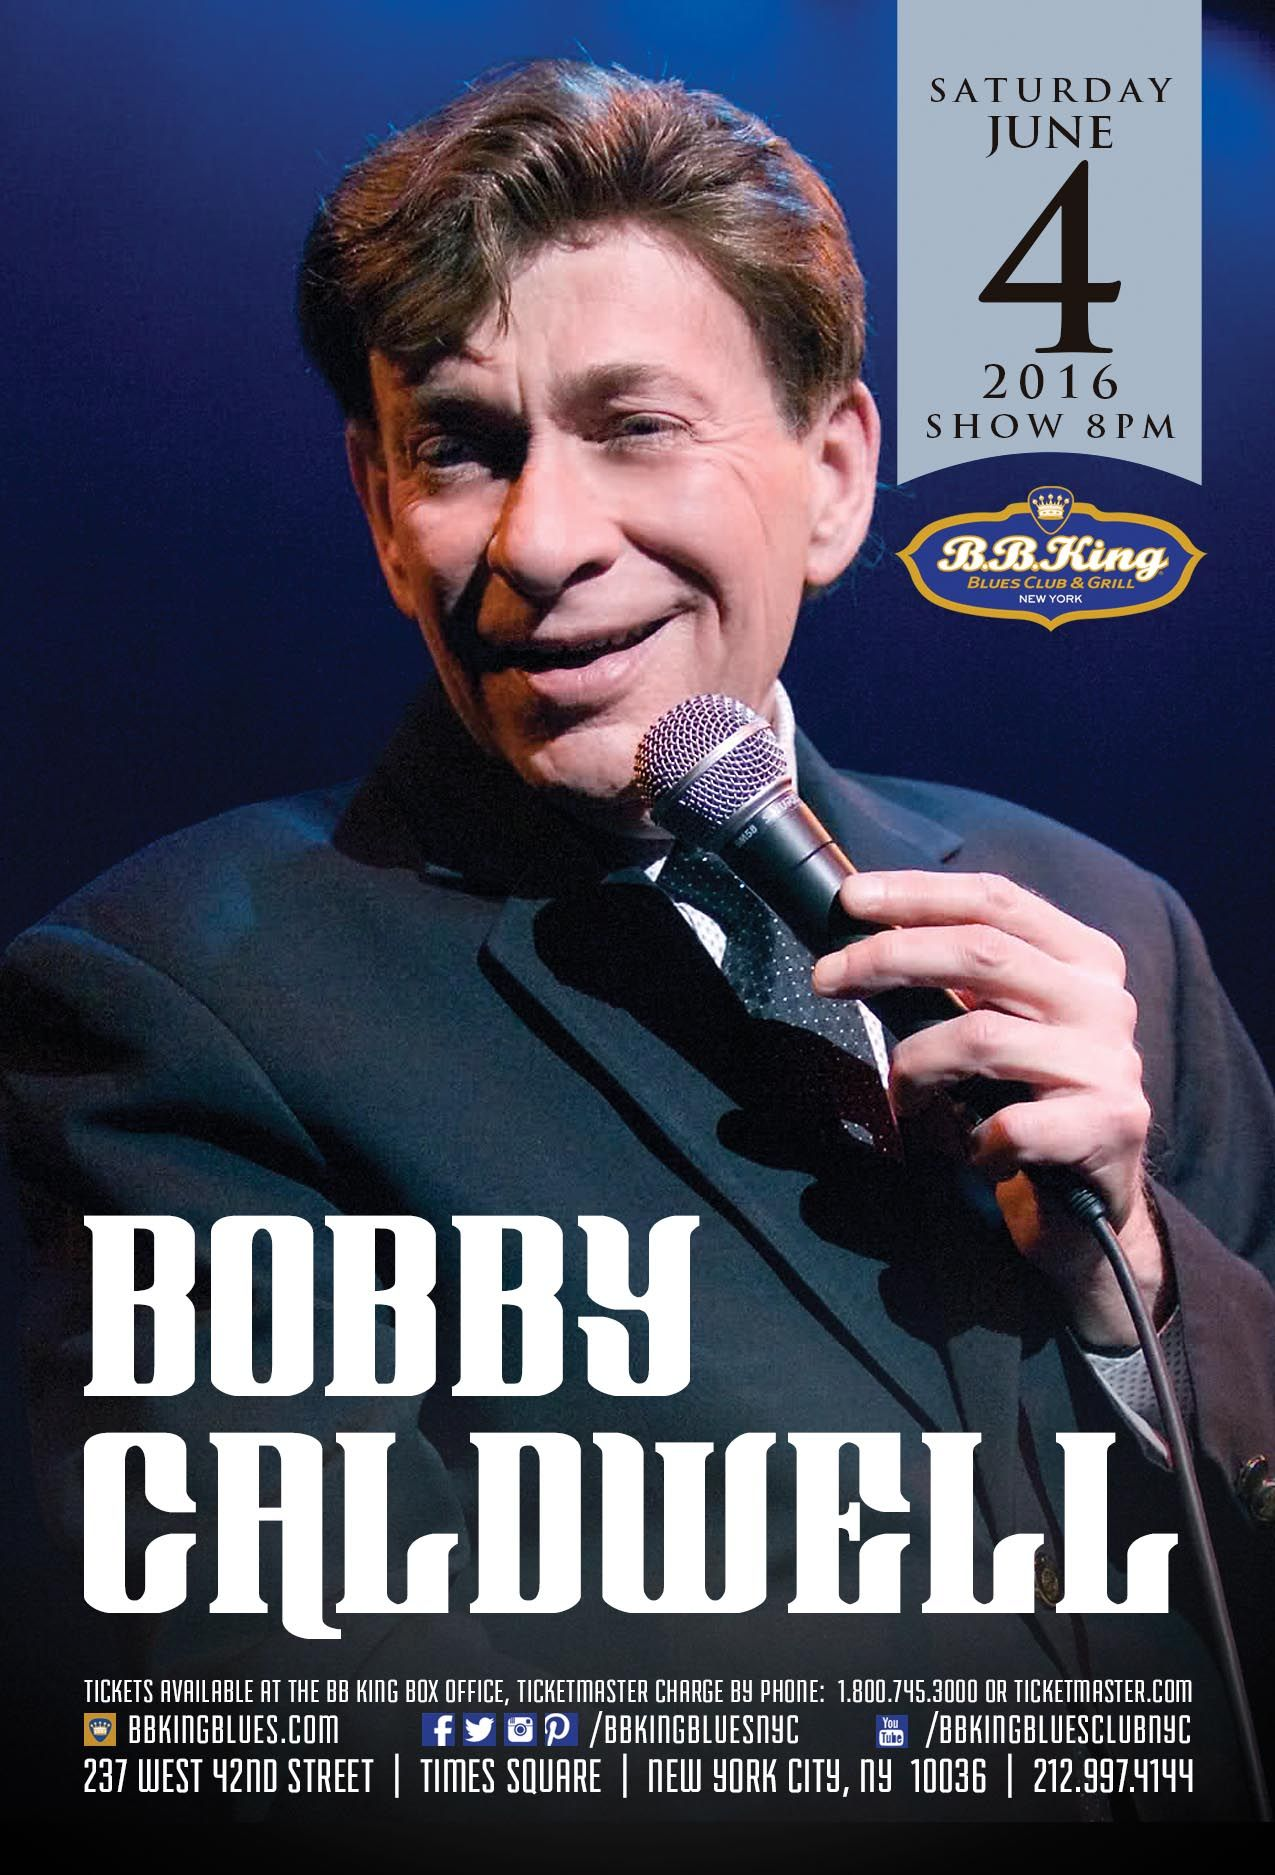 Bobby Caldwell 6 4 16 Bobby Ticketmaster Times Square New York